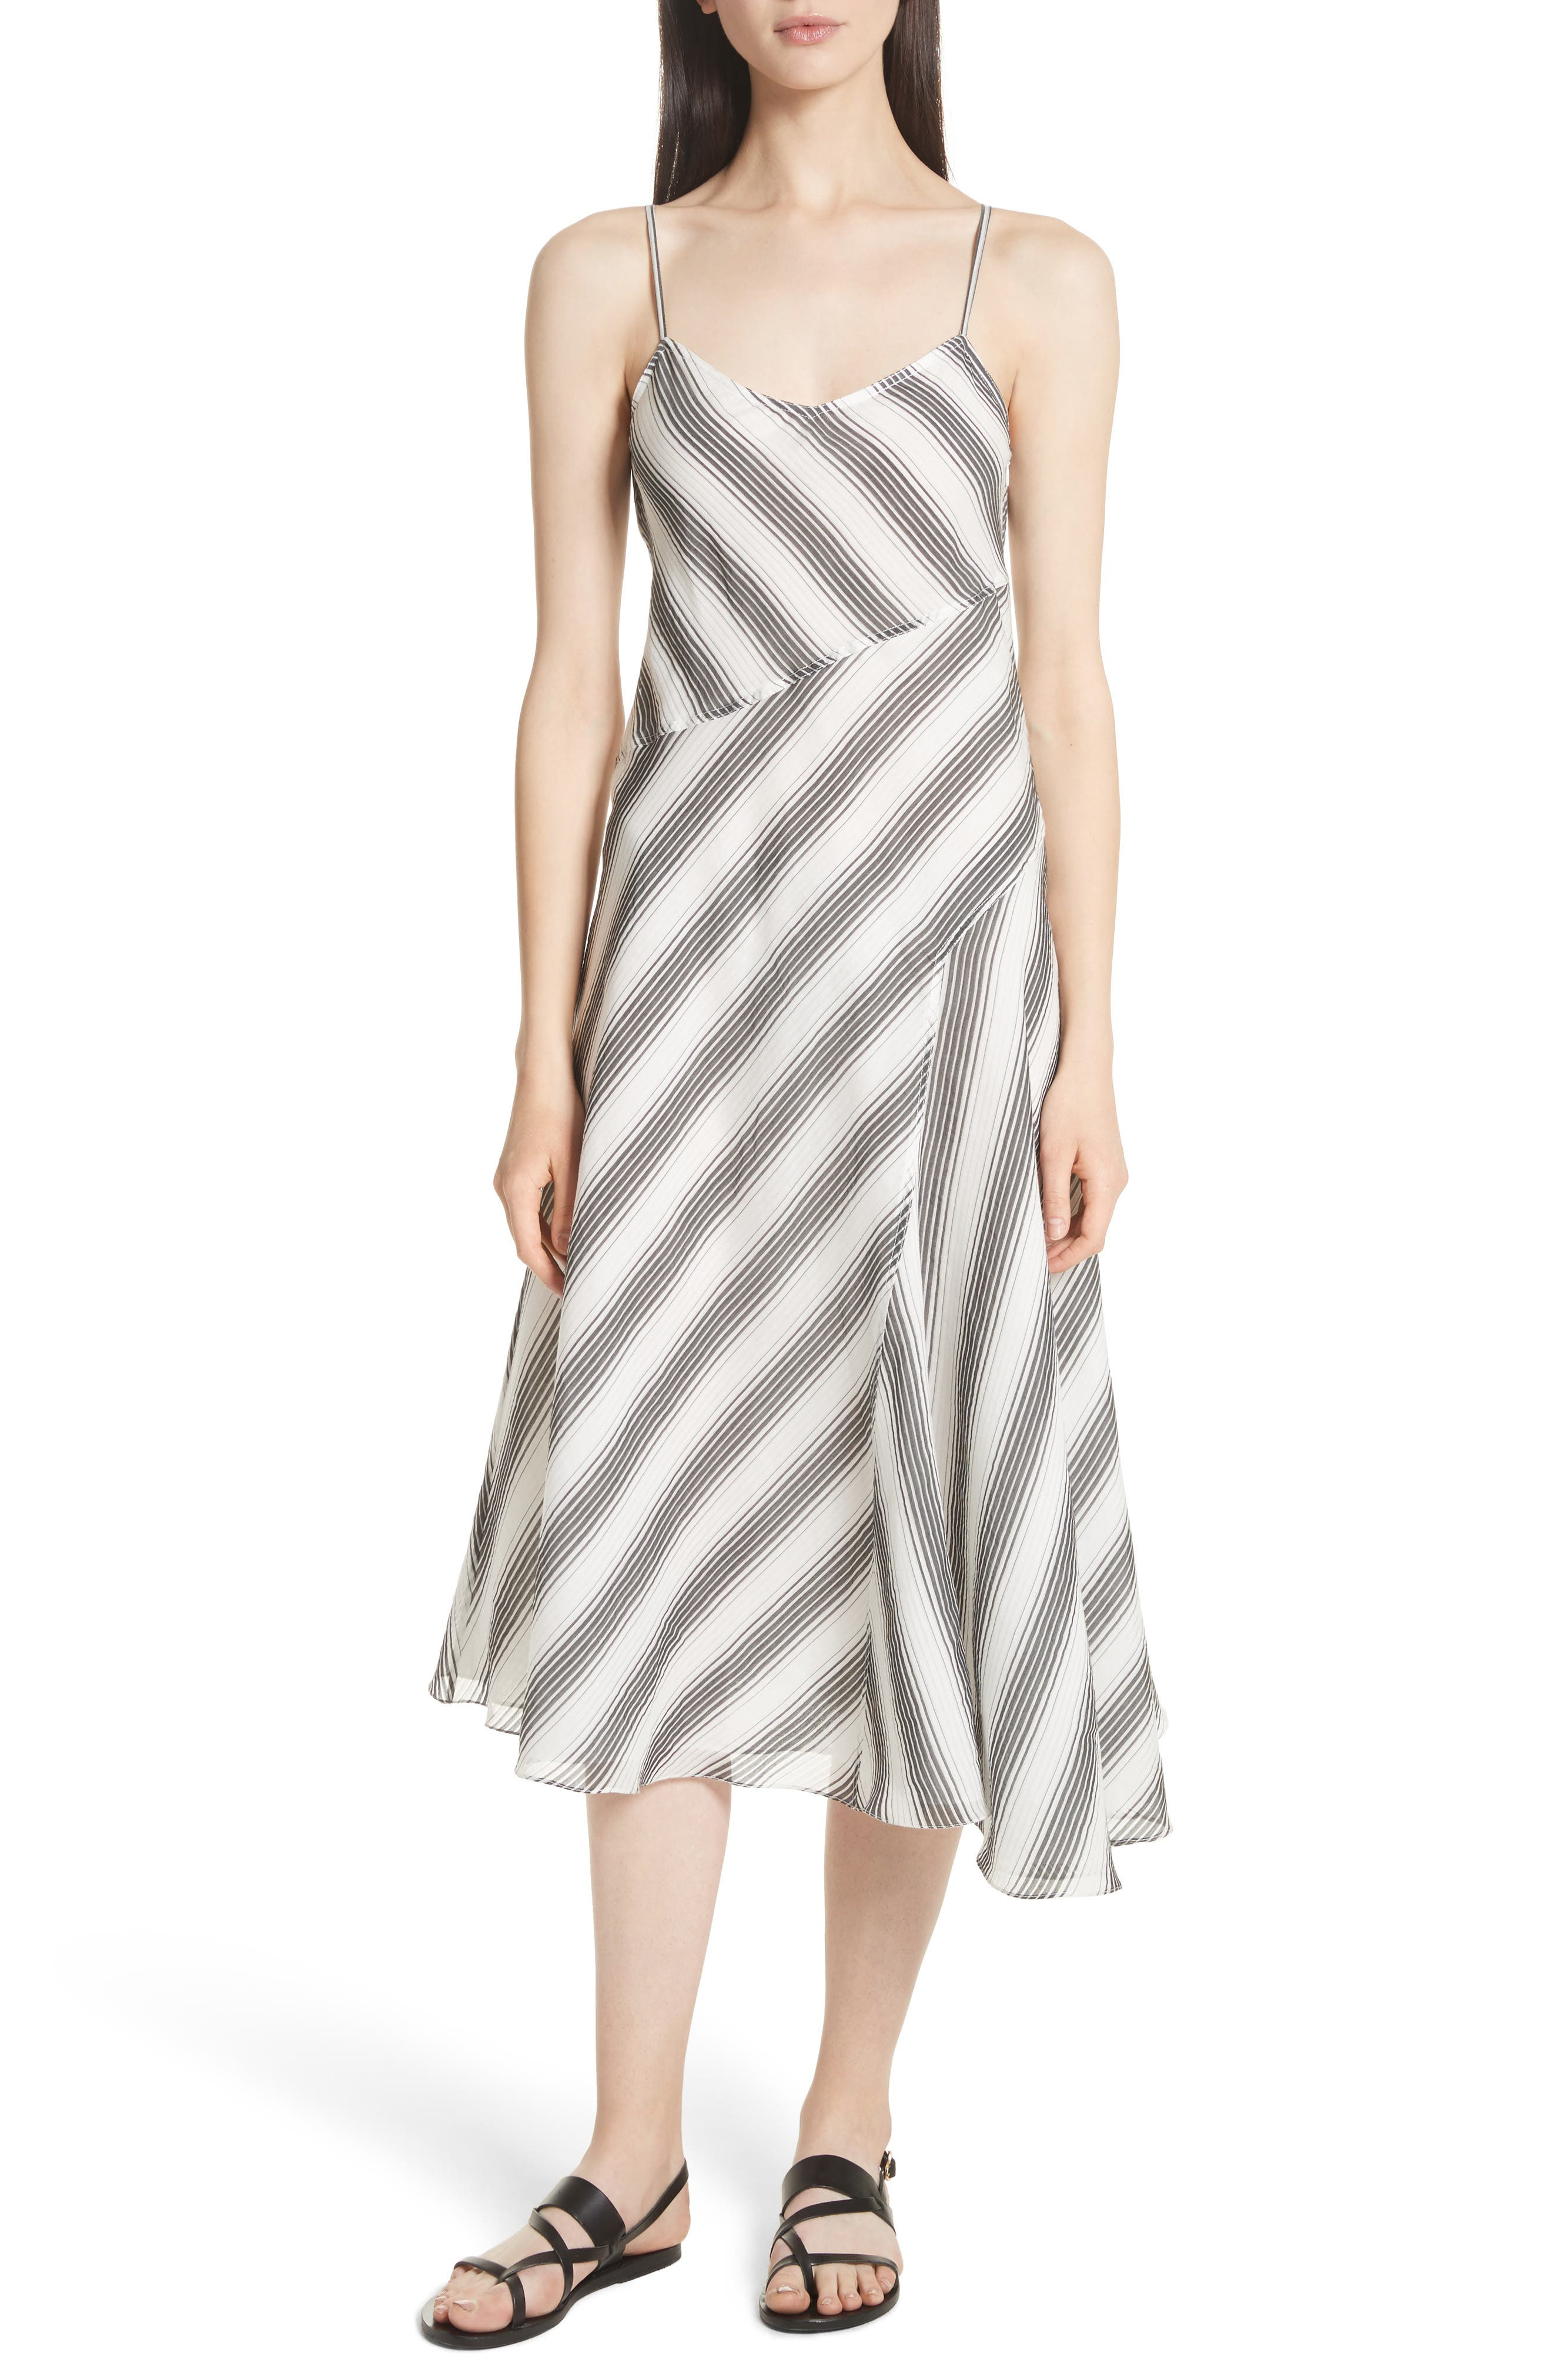 Spaghetti Strap Day Dress,                         Main,                         color, Ivory/ Black